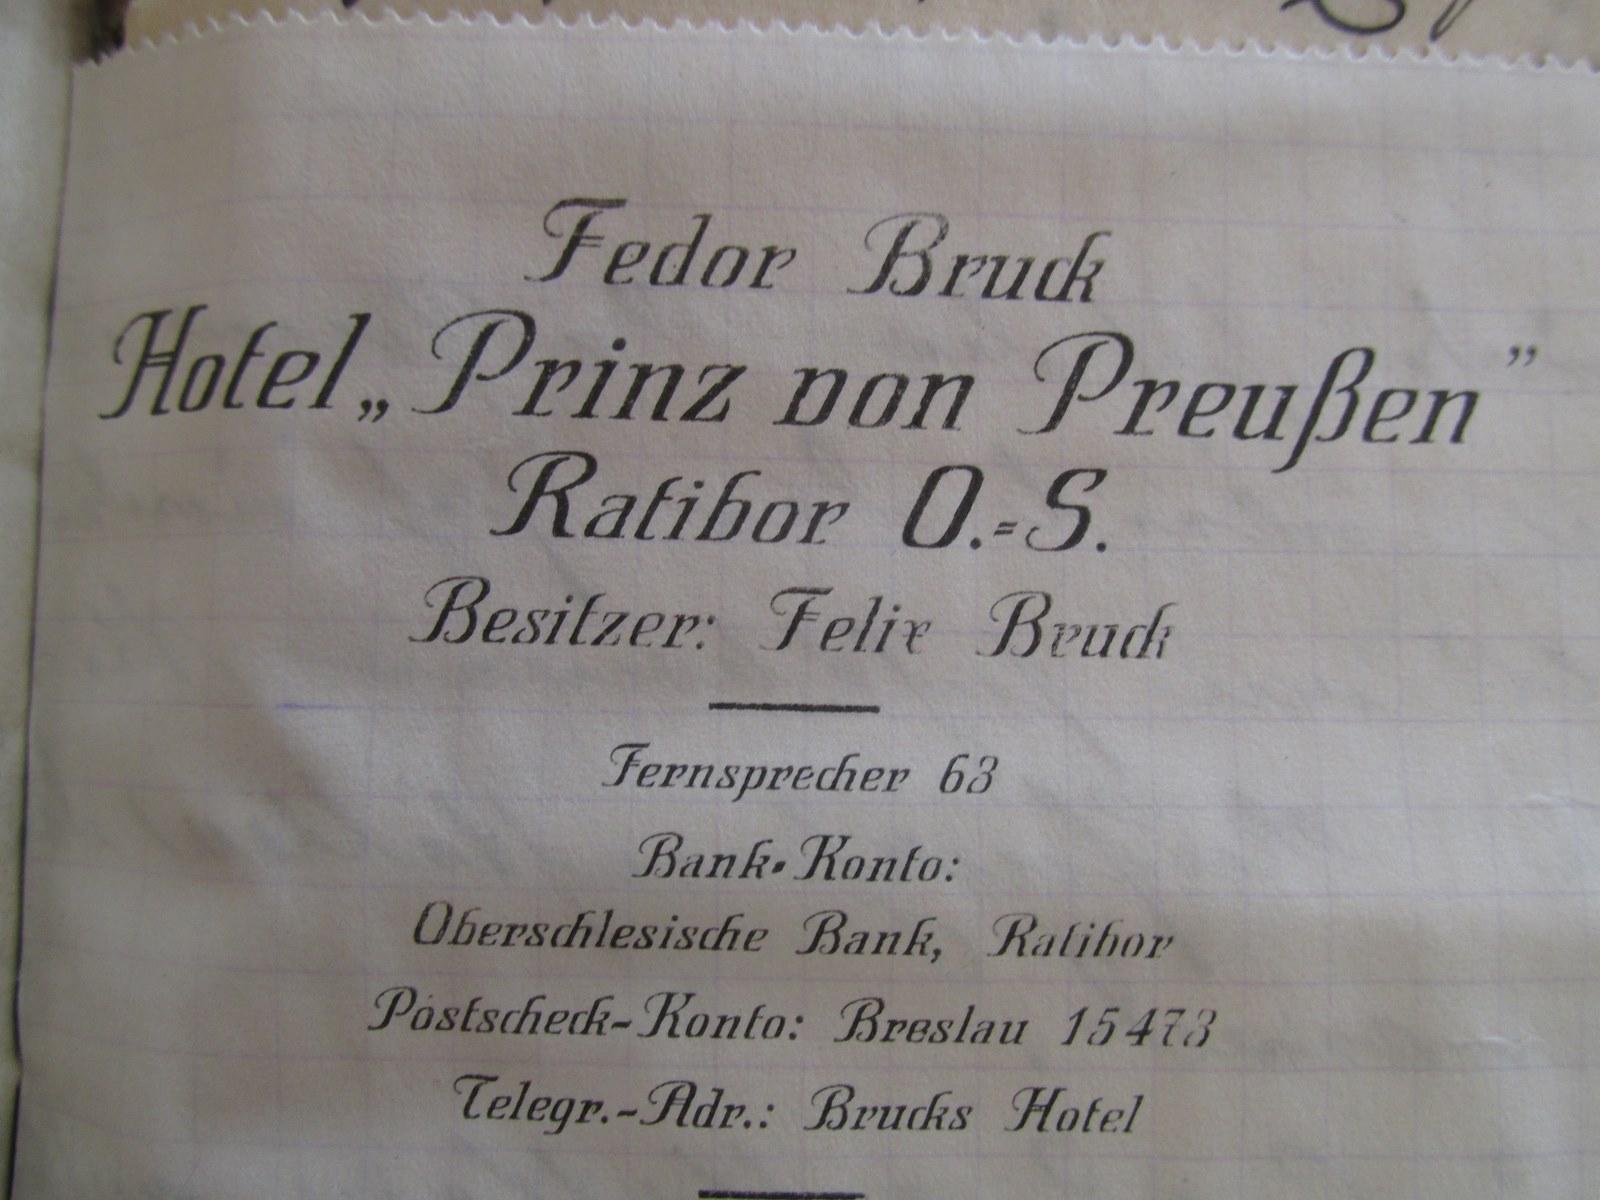 Bruck Hotel (168)